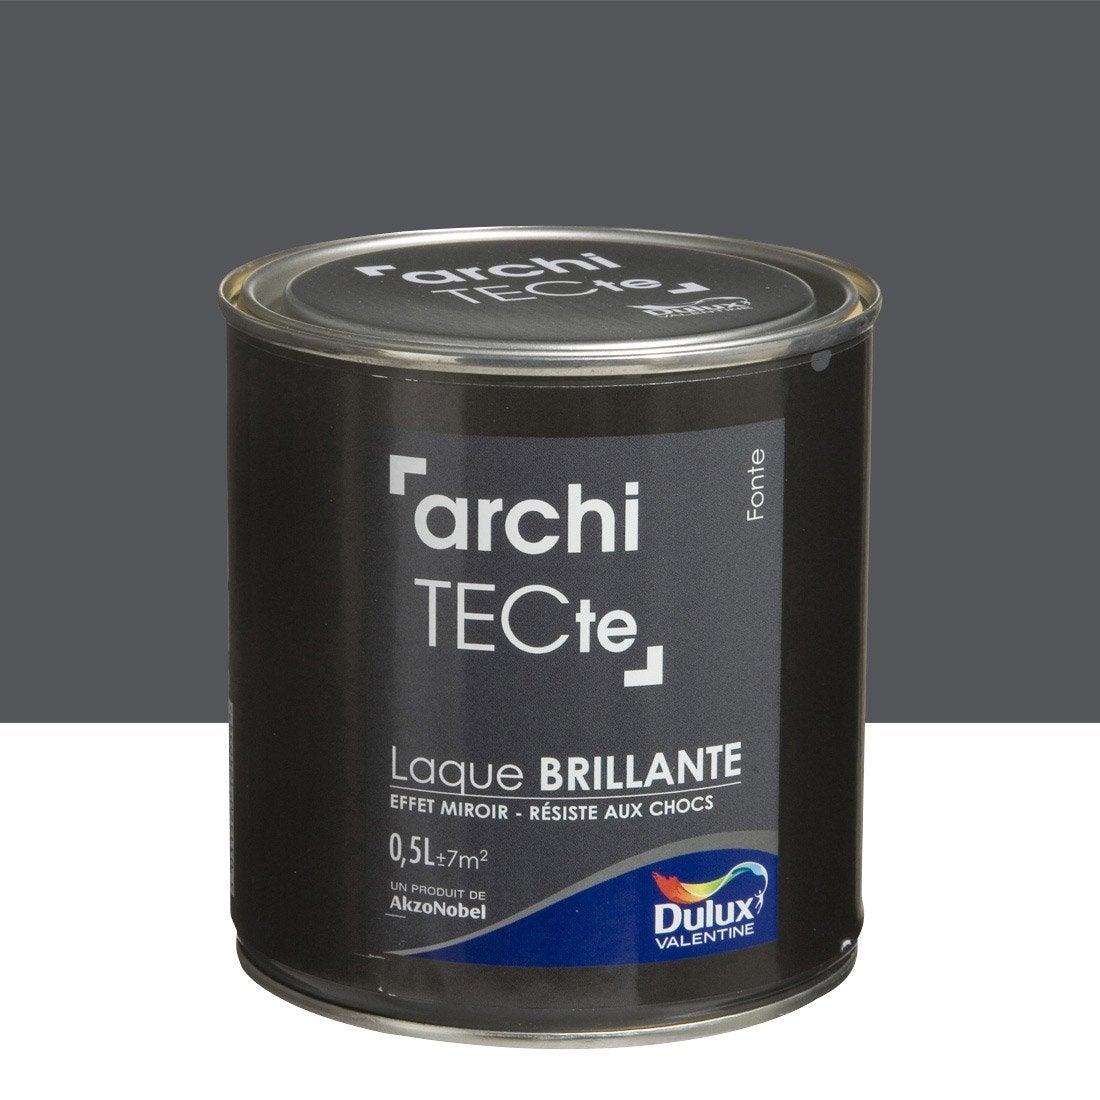 peinture gris fonte dulux valentine architecte 0 5 l leroy merlin. Black Bedroom Furniture Sets. Home Design Ideas